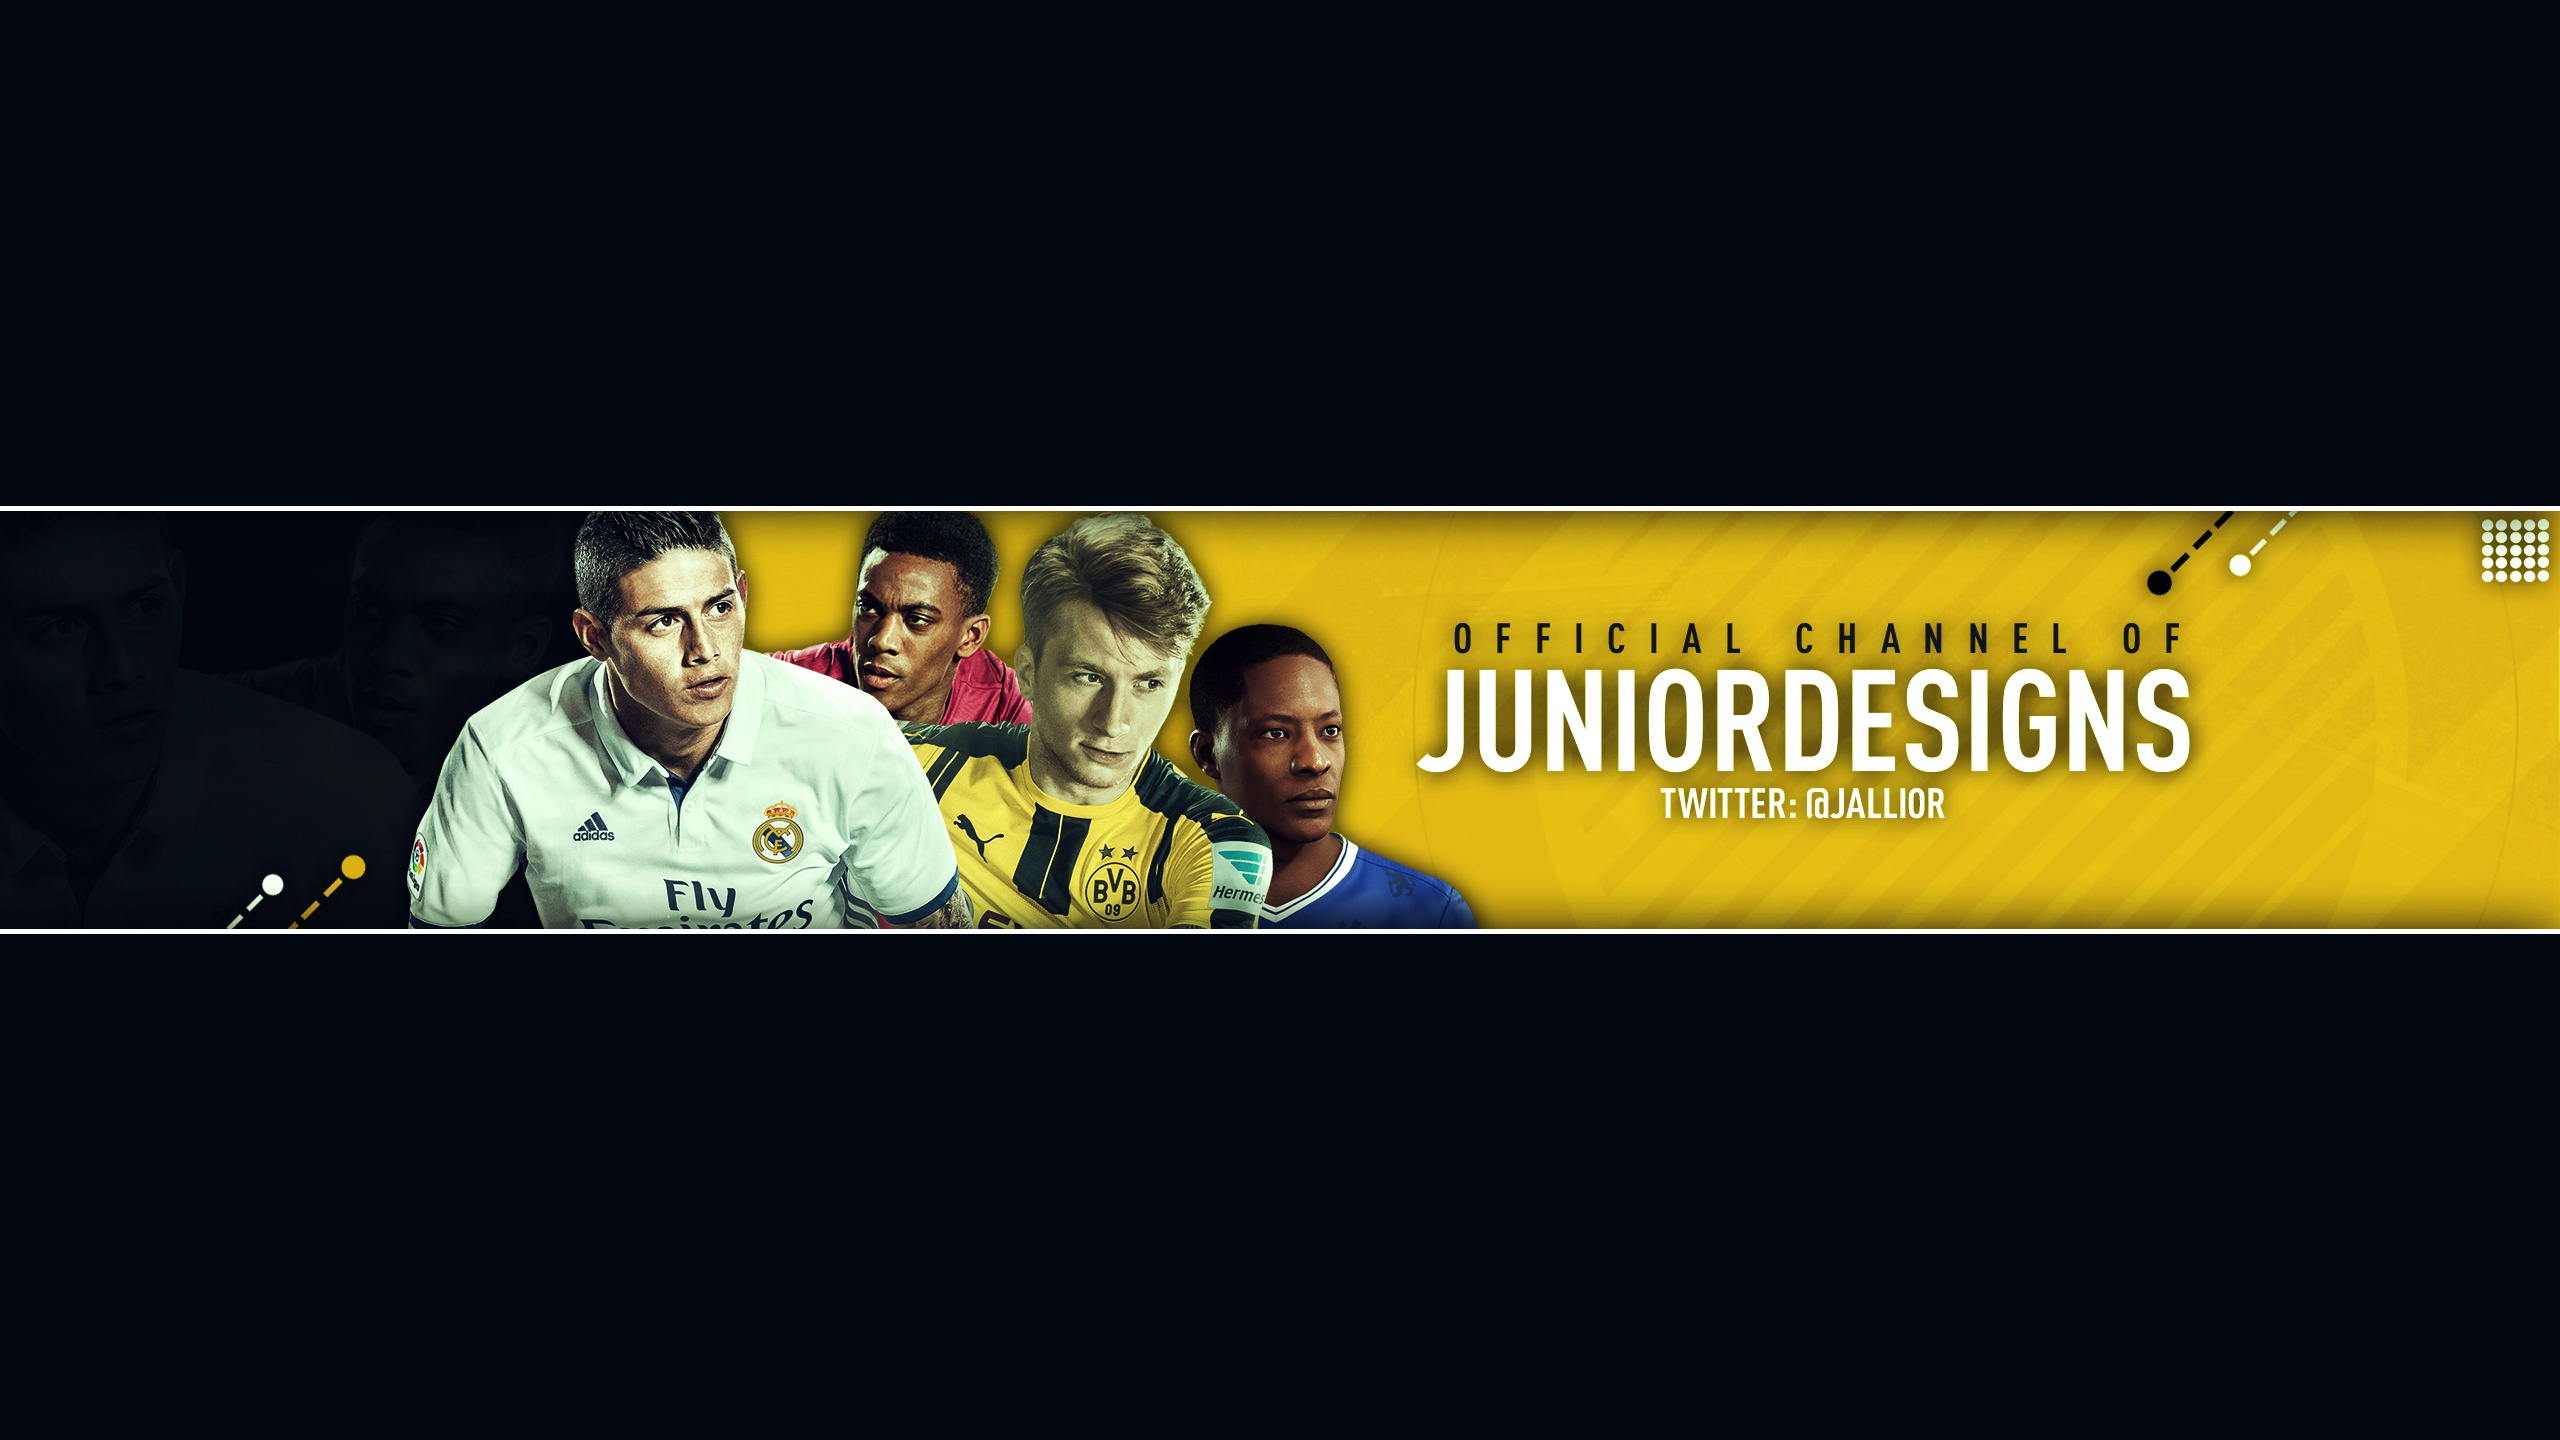 FIFA 17 BANNER VERSION 2!